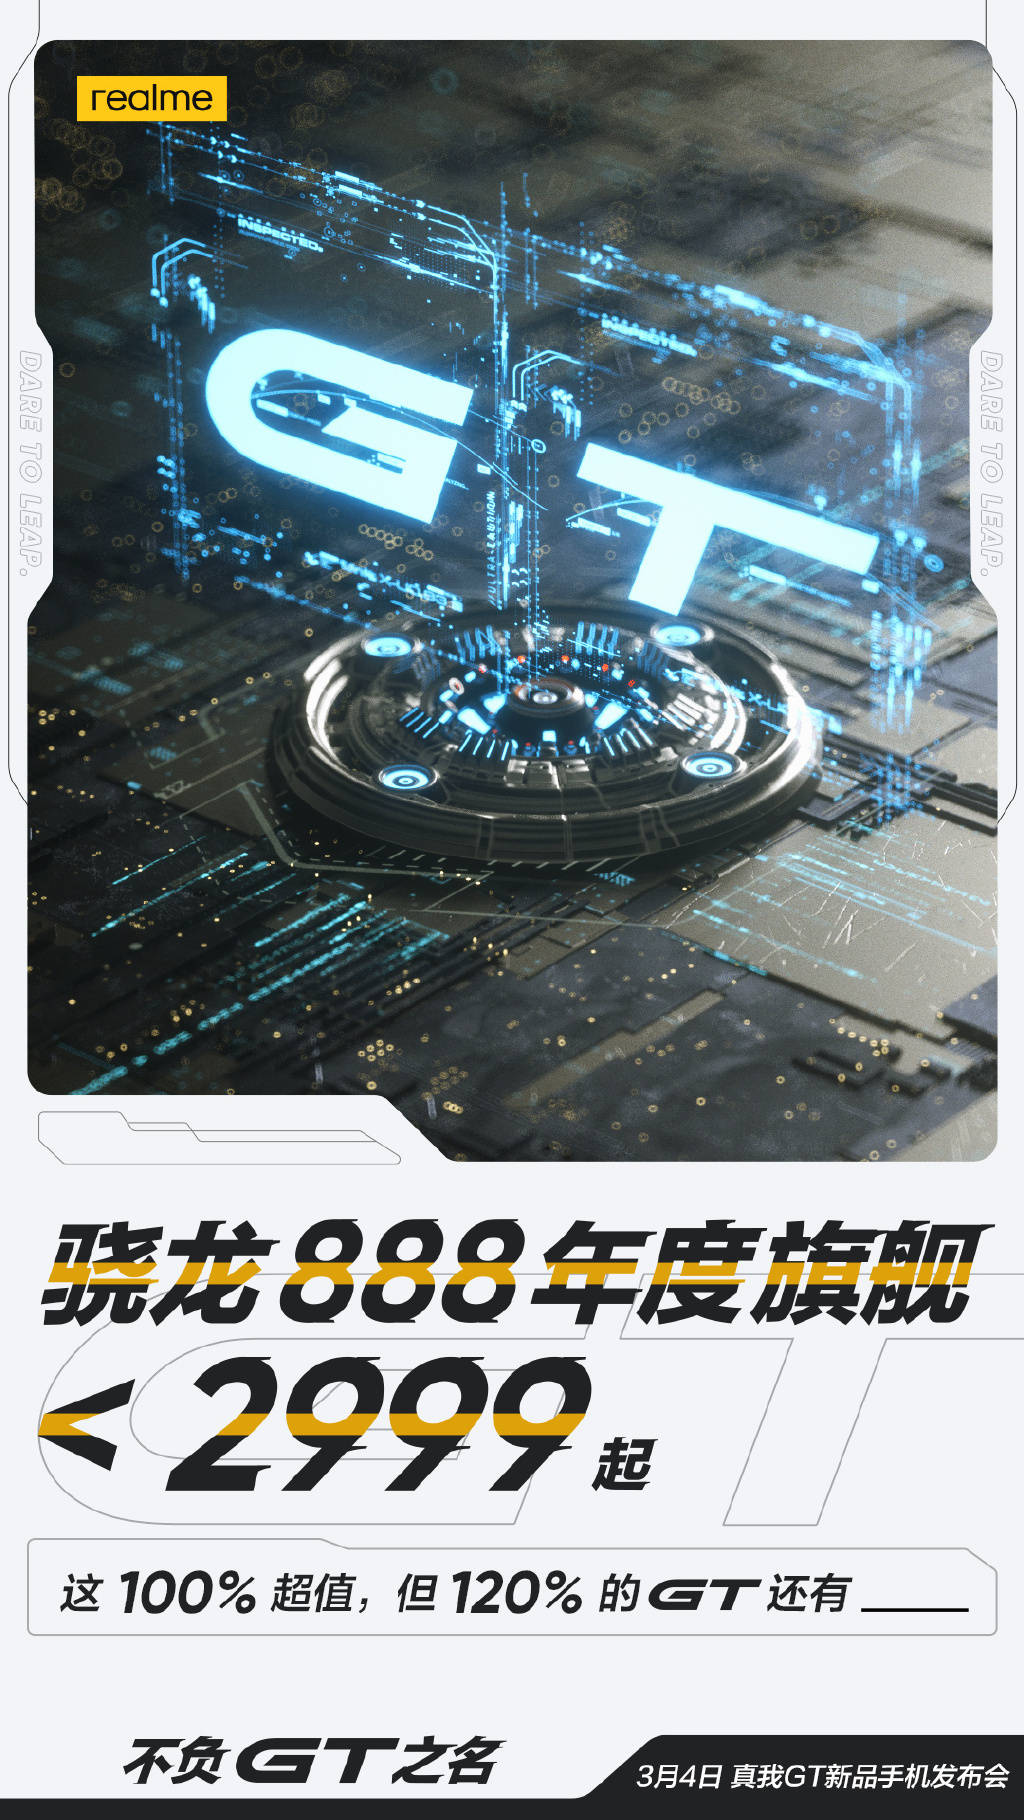 Redmi K40遭遇强敌,友商骁龙888旗舰低于2999元,iQOO7却尴尬了